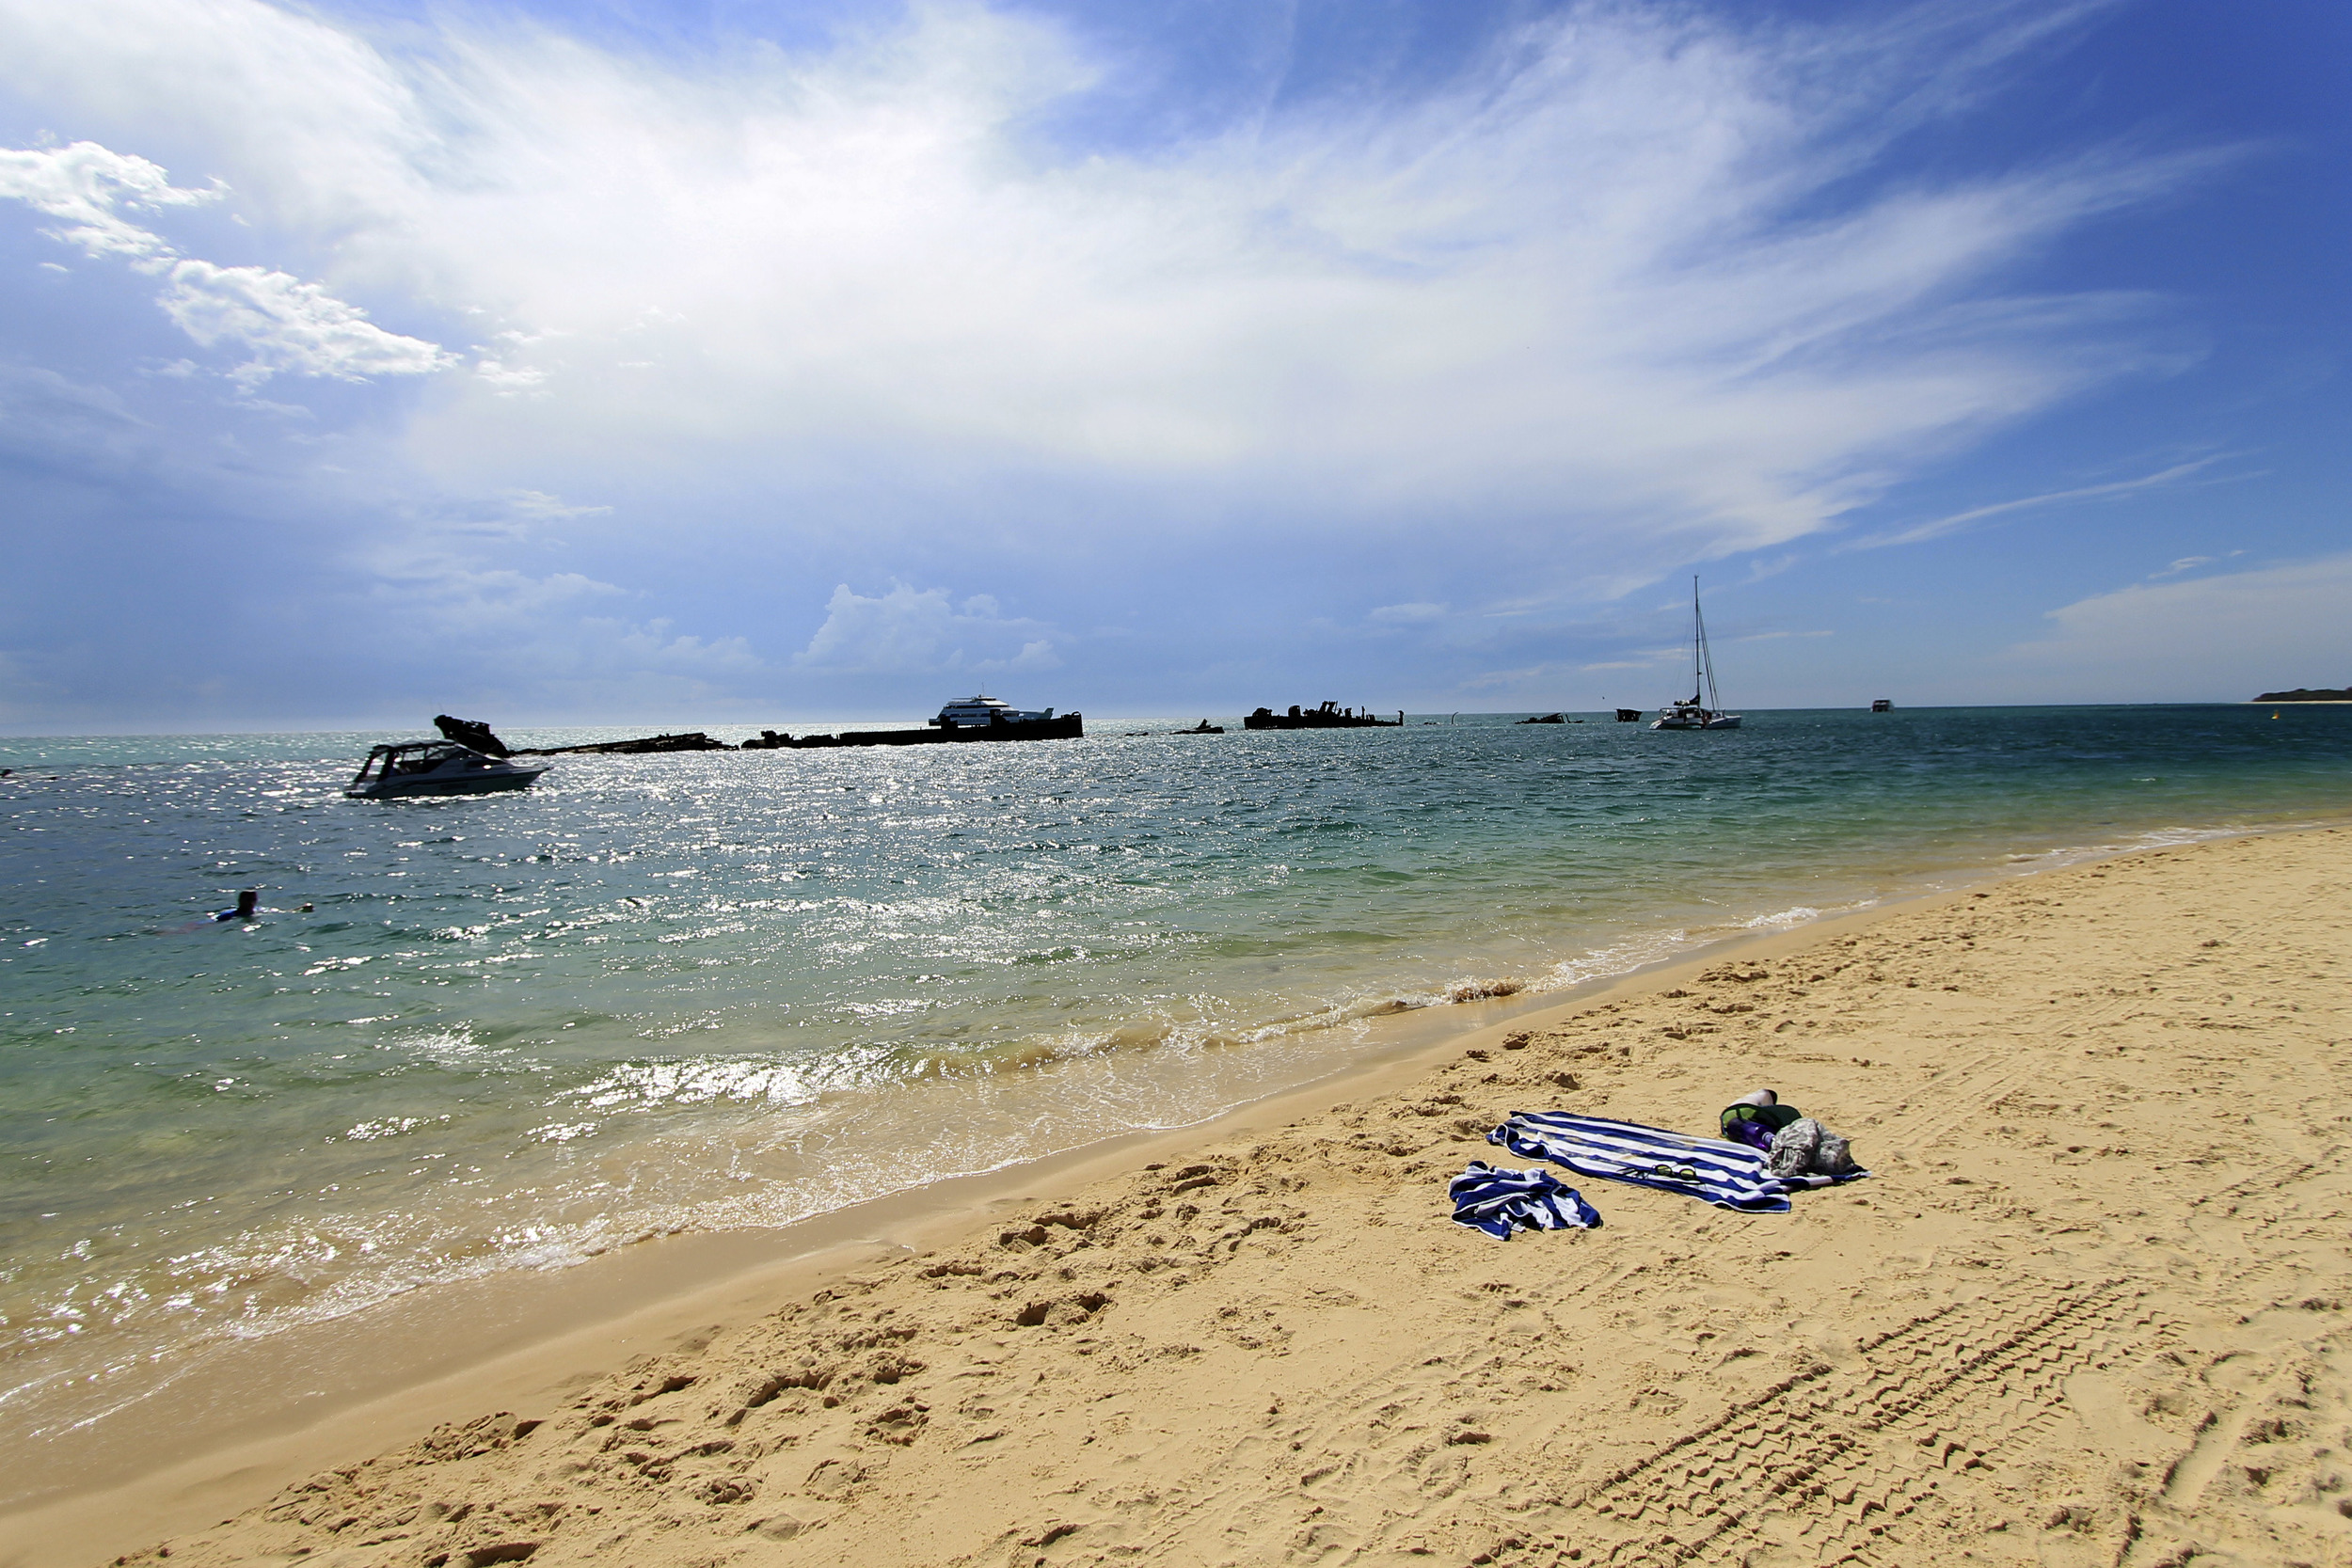 tangalooma-wrecks-shipwrecks-island-moreton-queensland.jpg